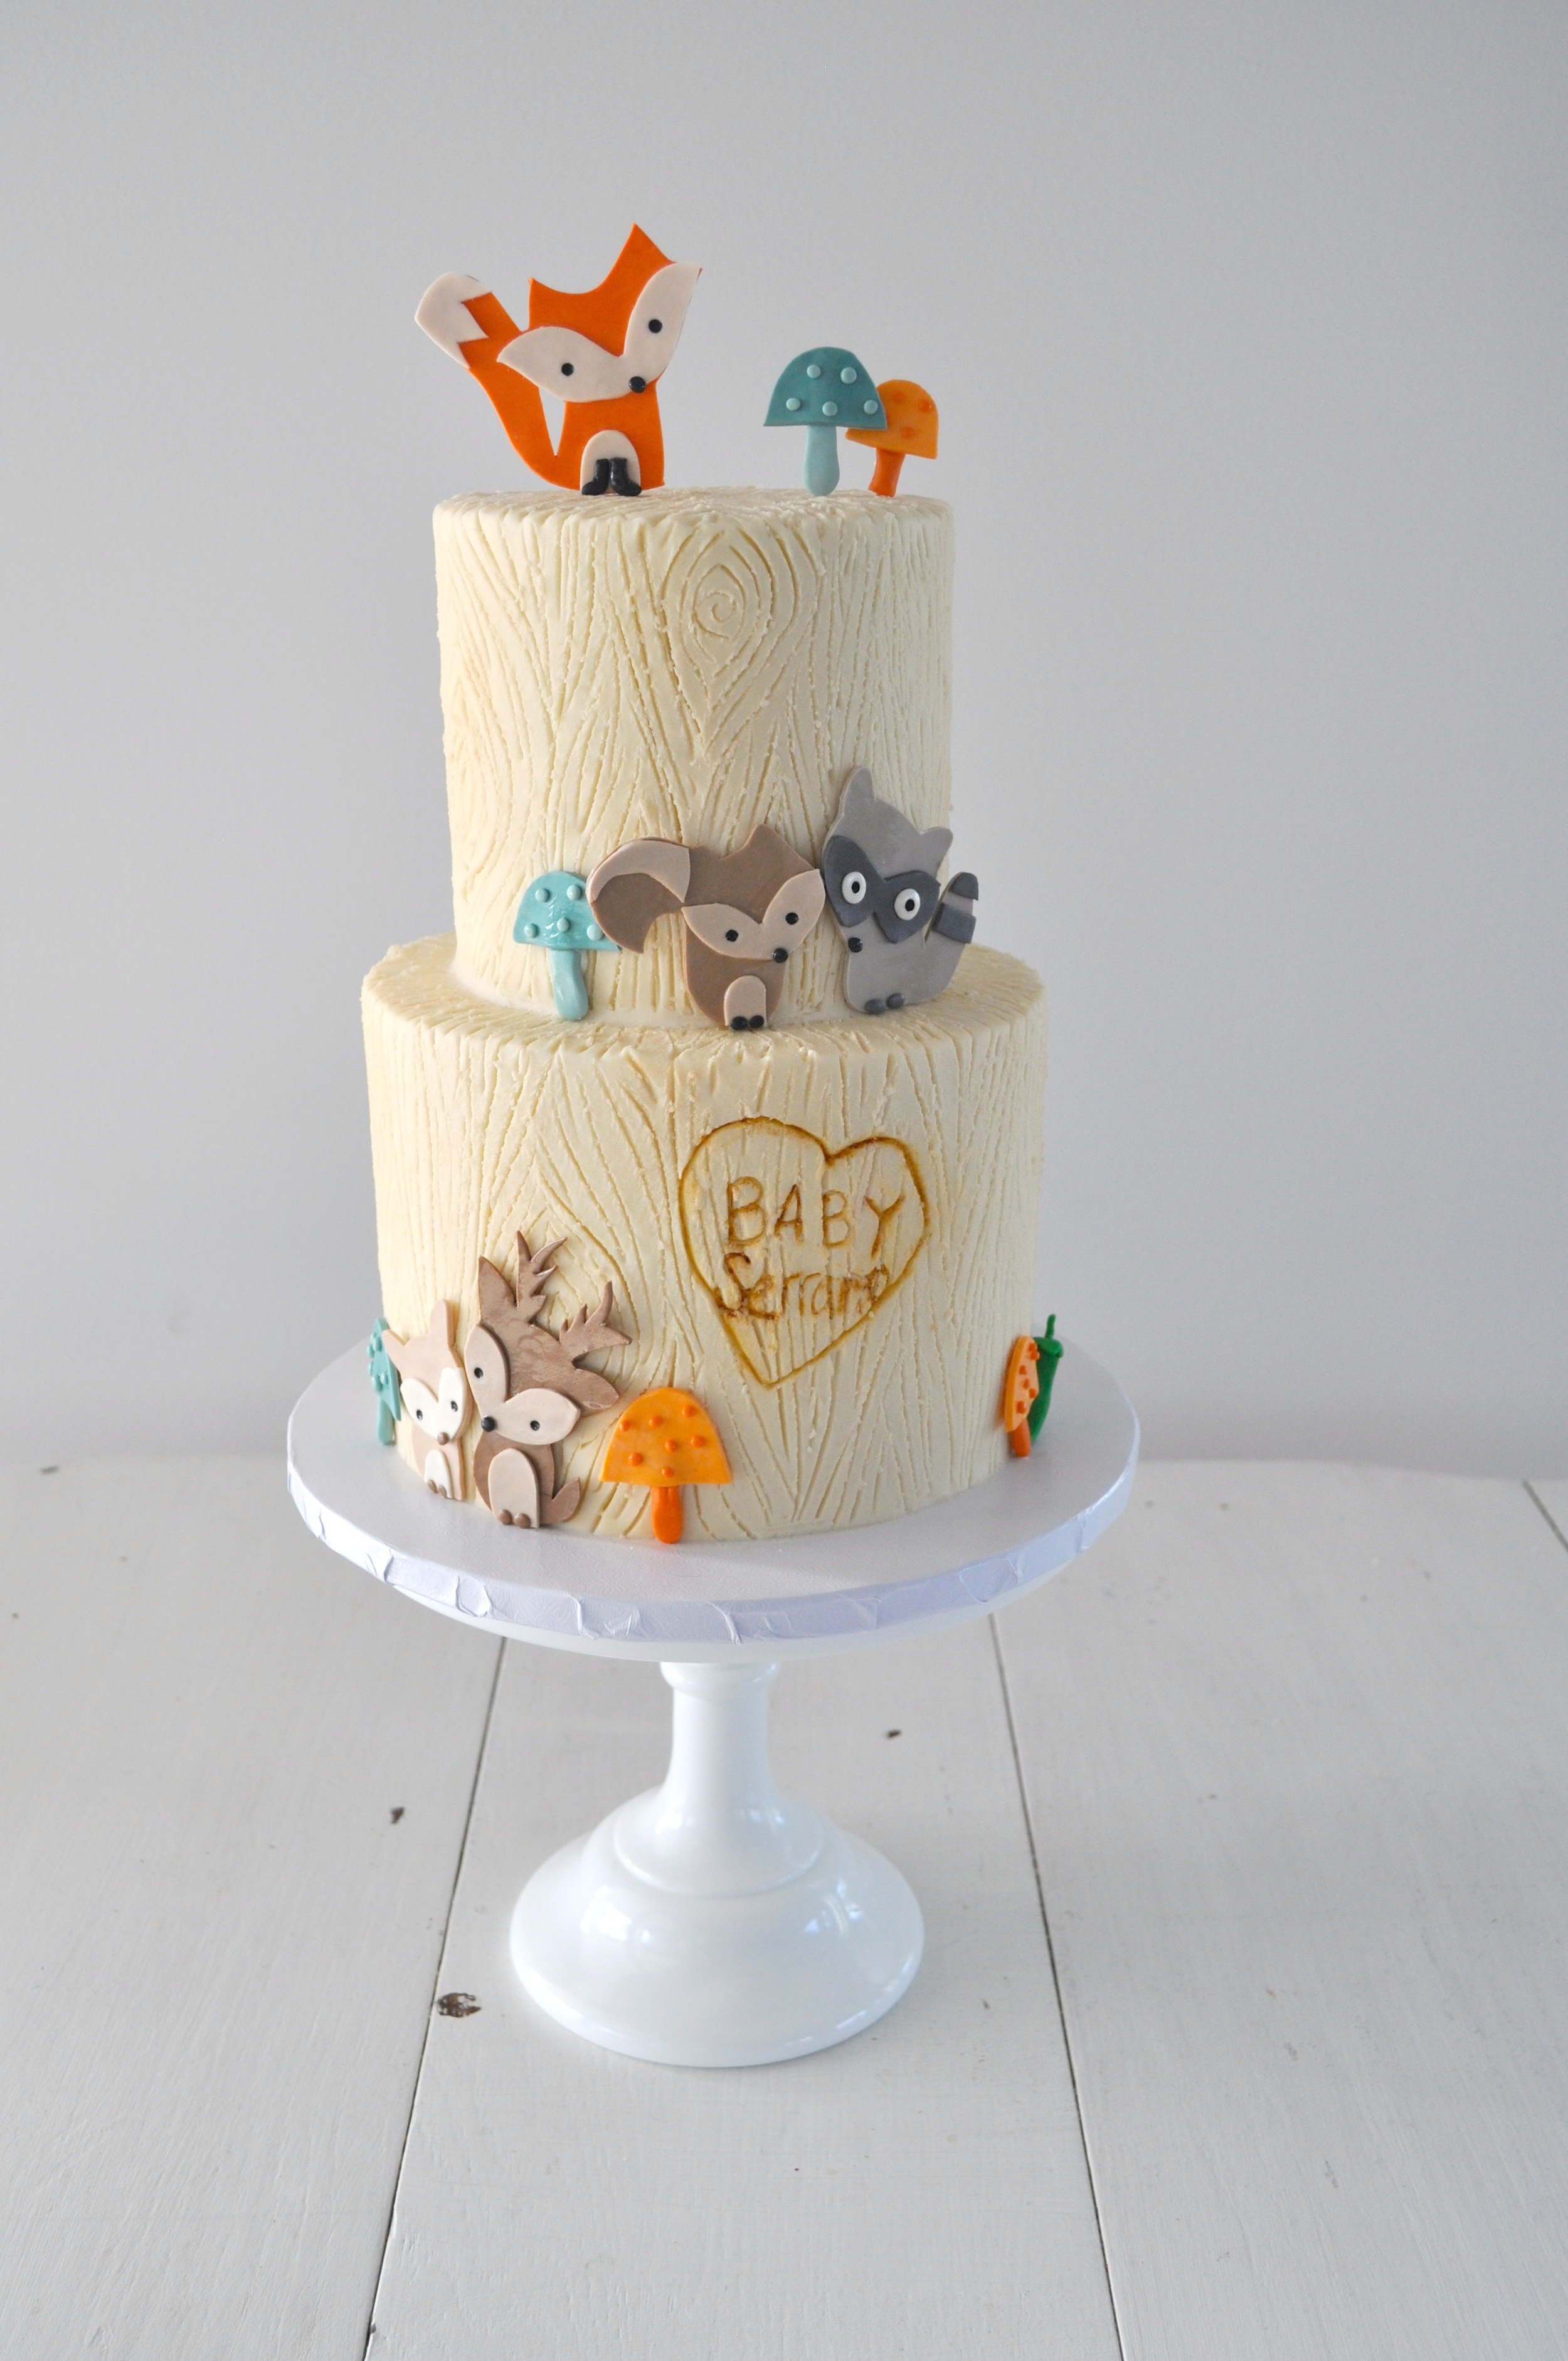 custom-cake-woodland-babyshower-sugarbeesweets.jpg